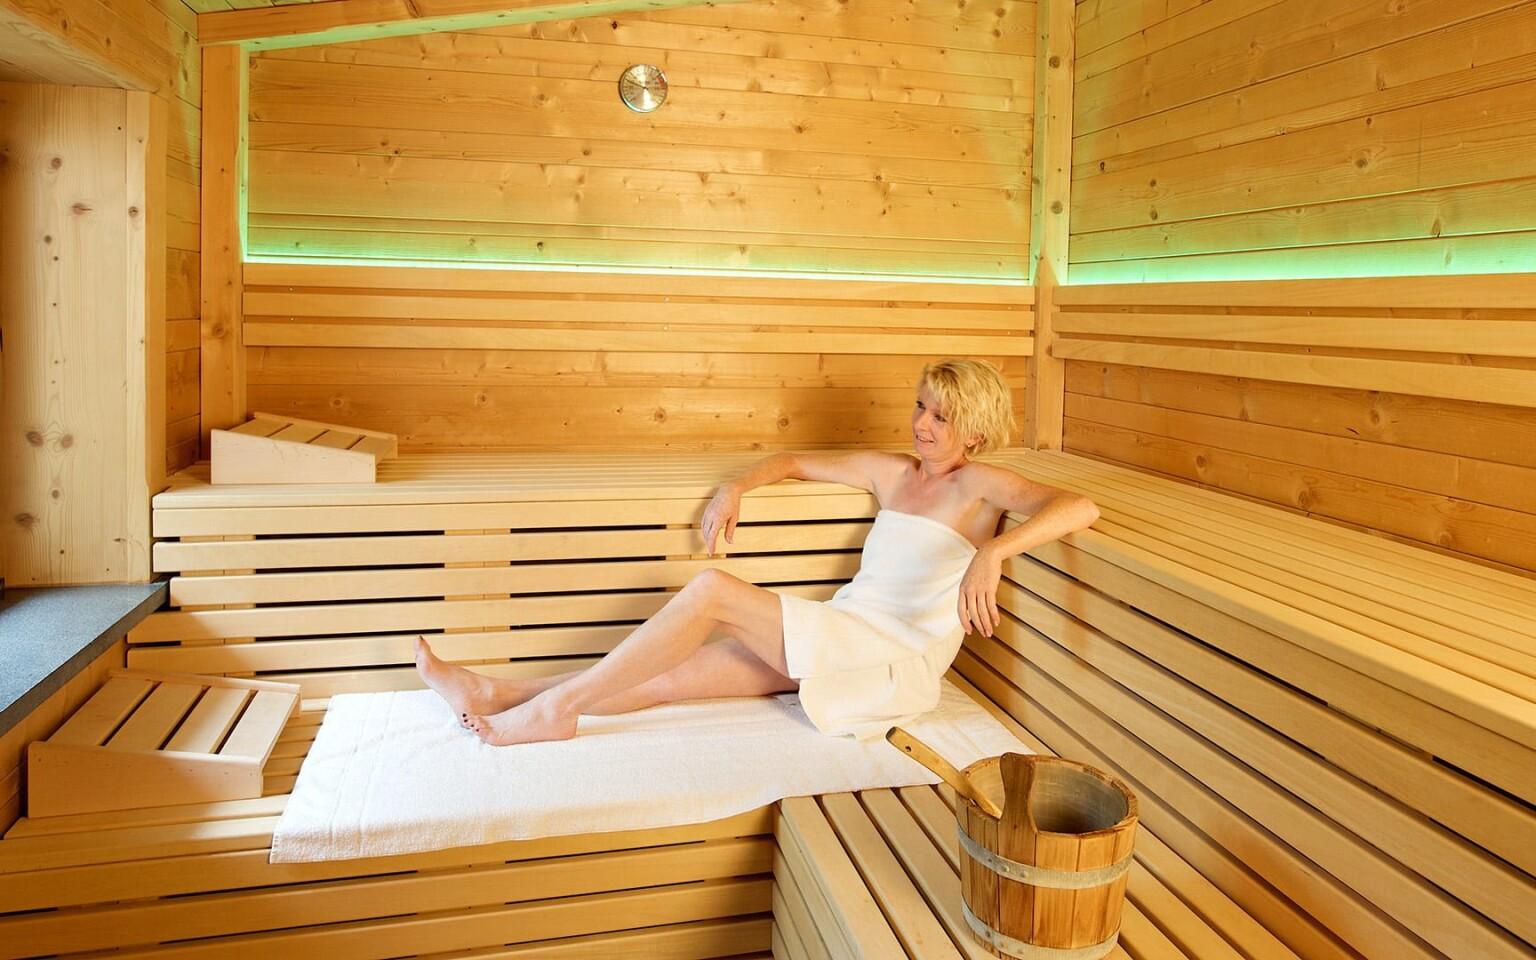 Termálne wellness, sauna, AktiVital Hotel, Nemecko